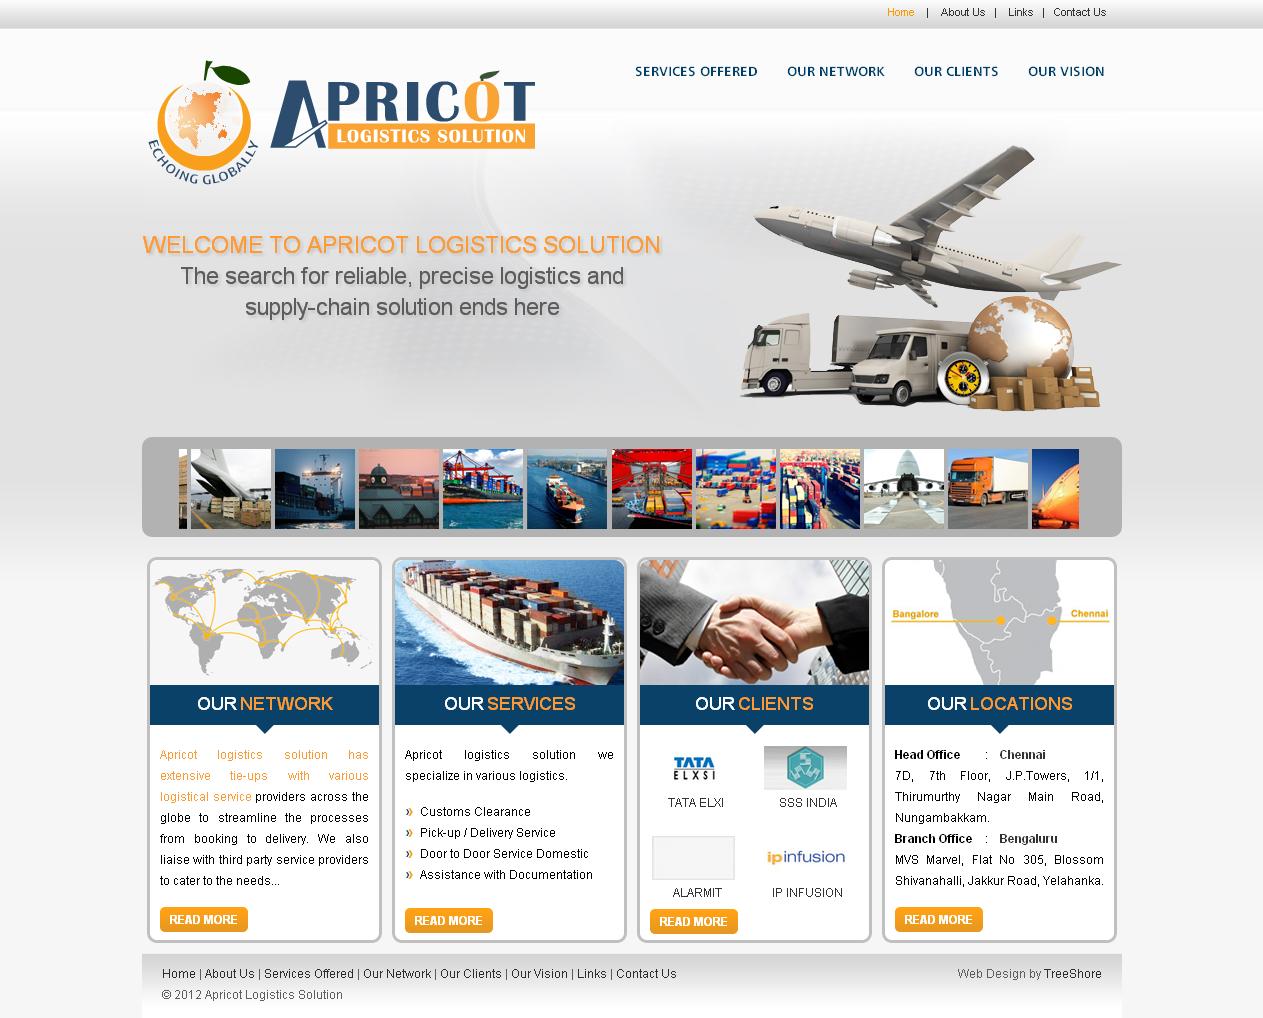 Apricot logistics solution